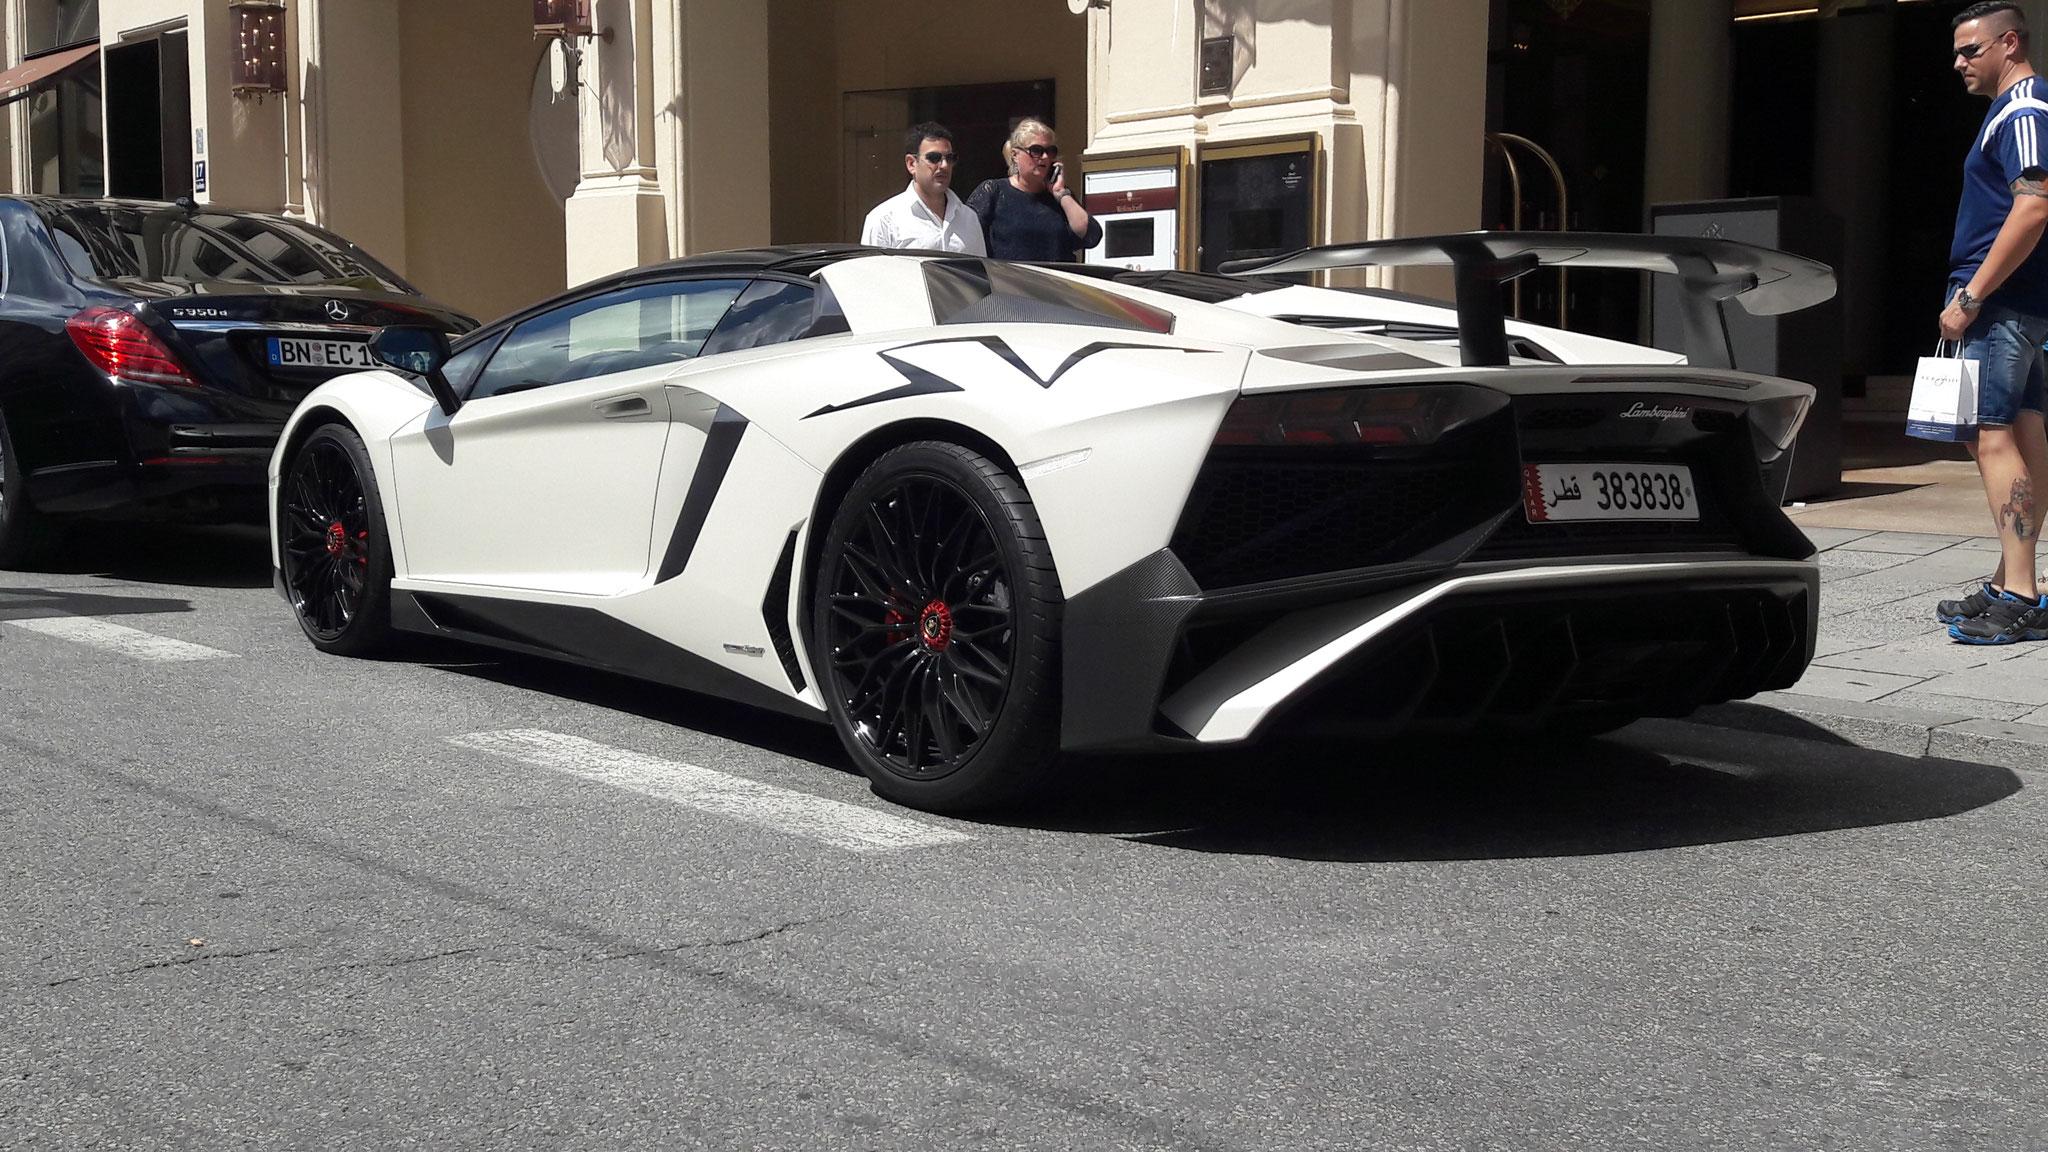 Lamborghini Aventador LP-750-4 SV Roadster  - 383838 (QAT)